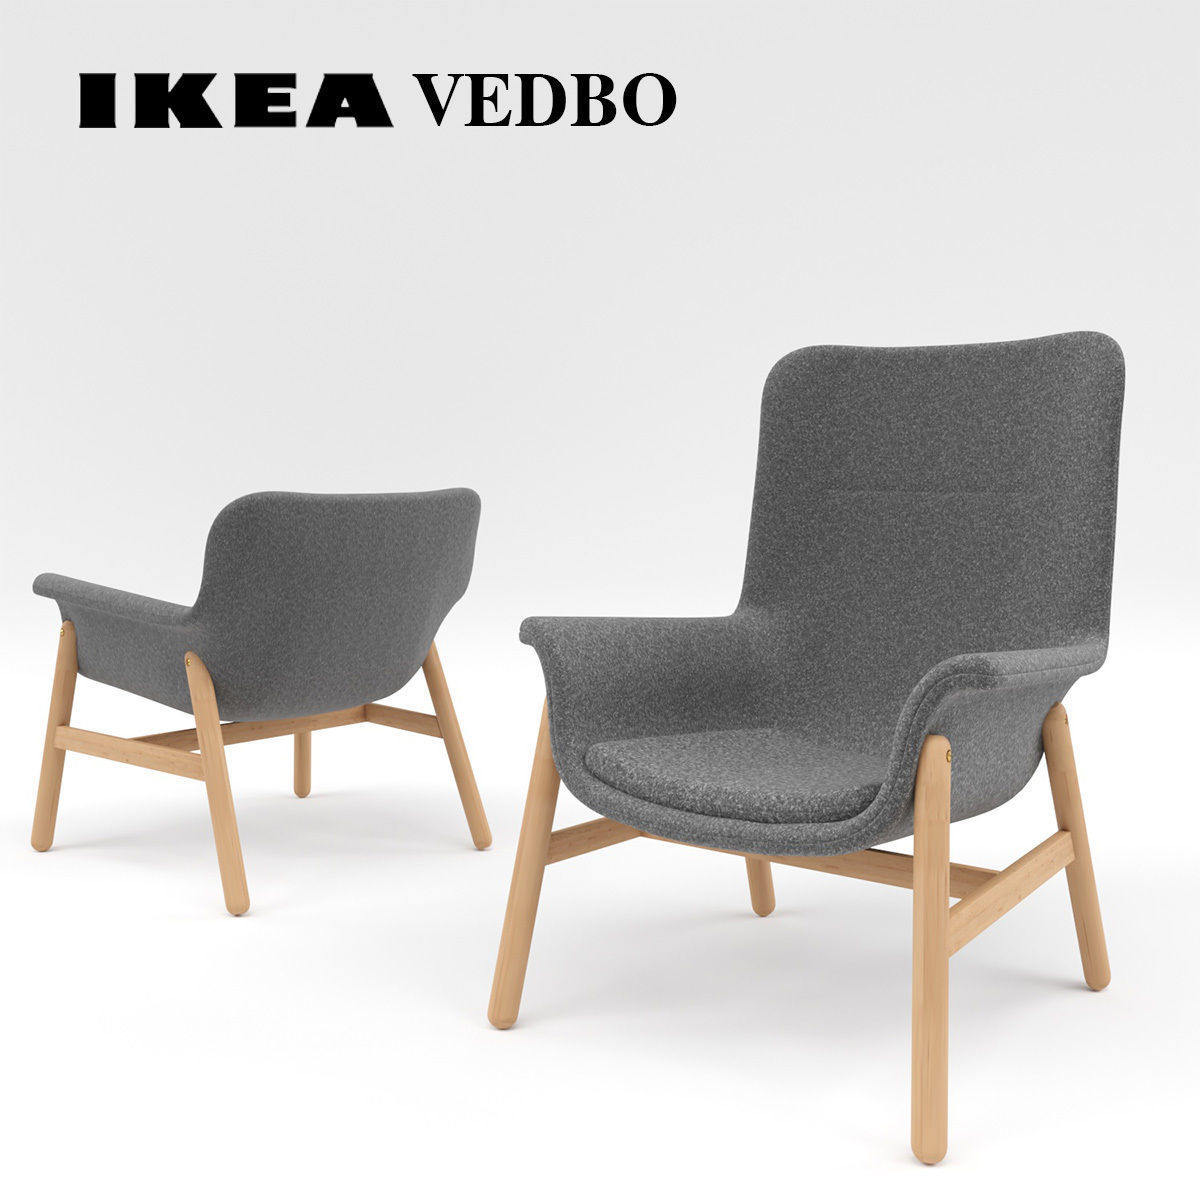 Ikea Vedbo High Back Armchair Model Max Obj Mtl Fbx Mat 1